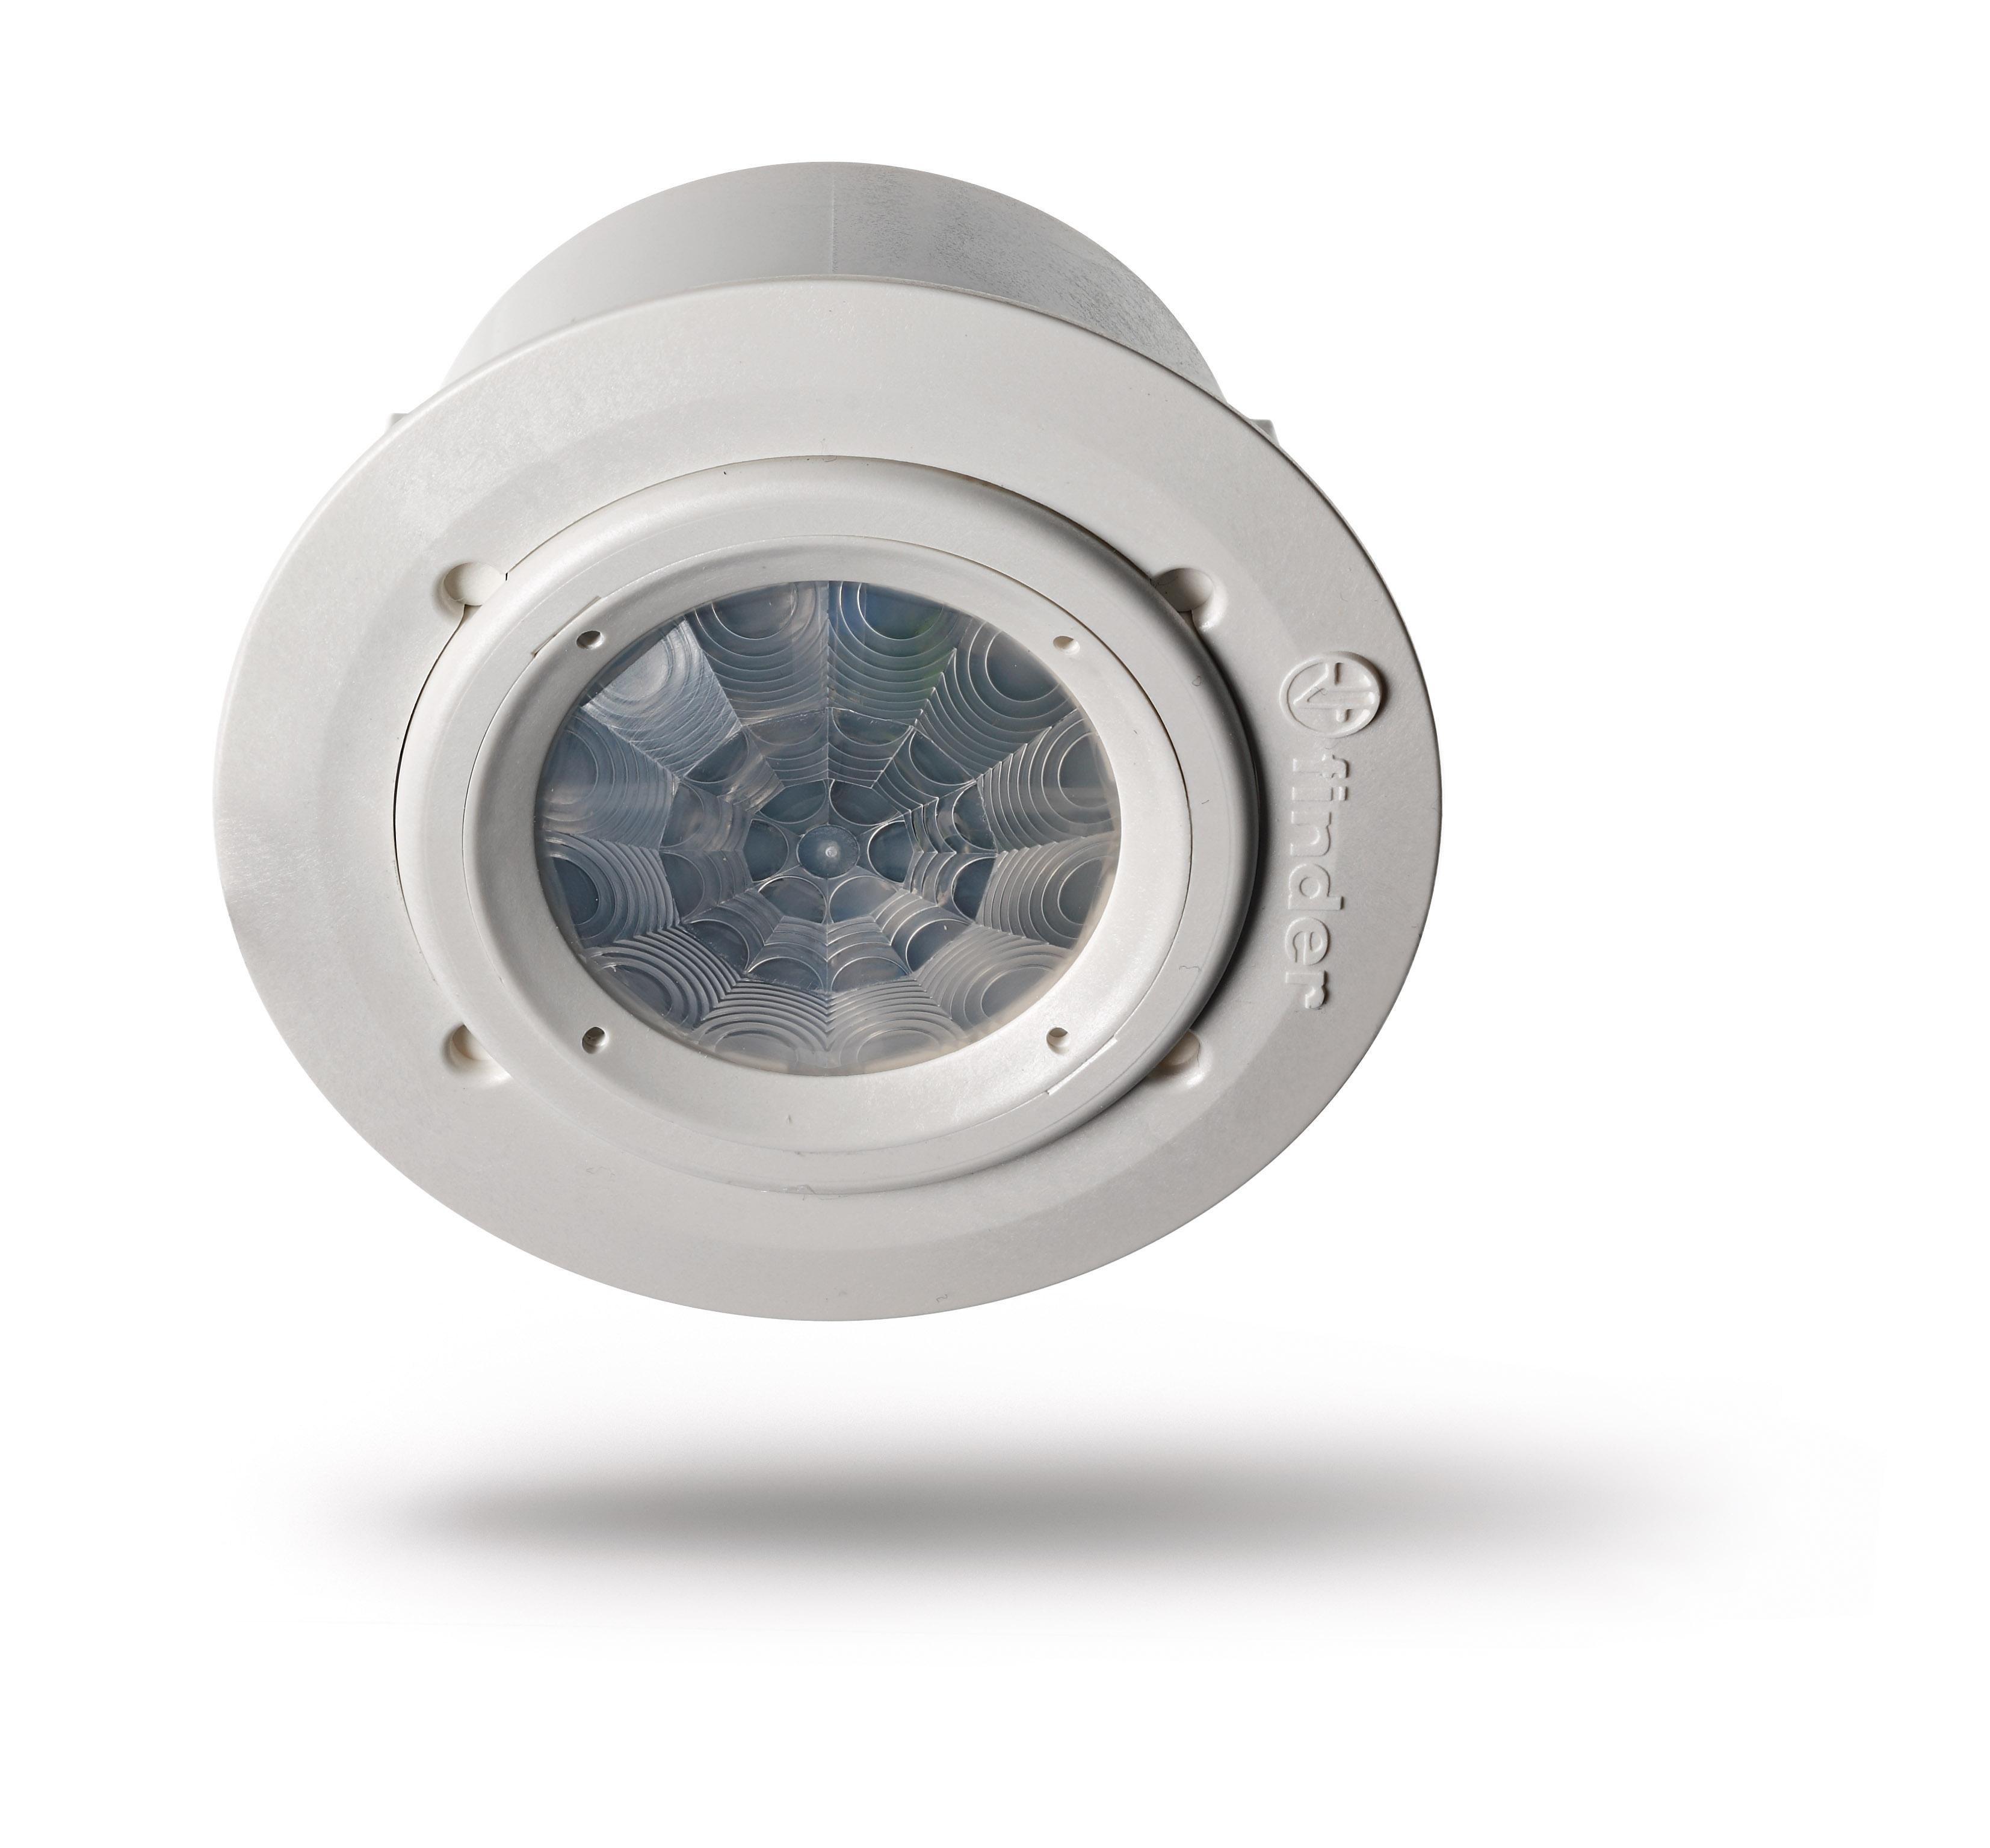 Finder 18 Series PIR Movement Detectors